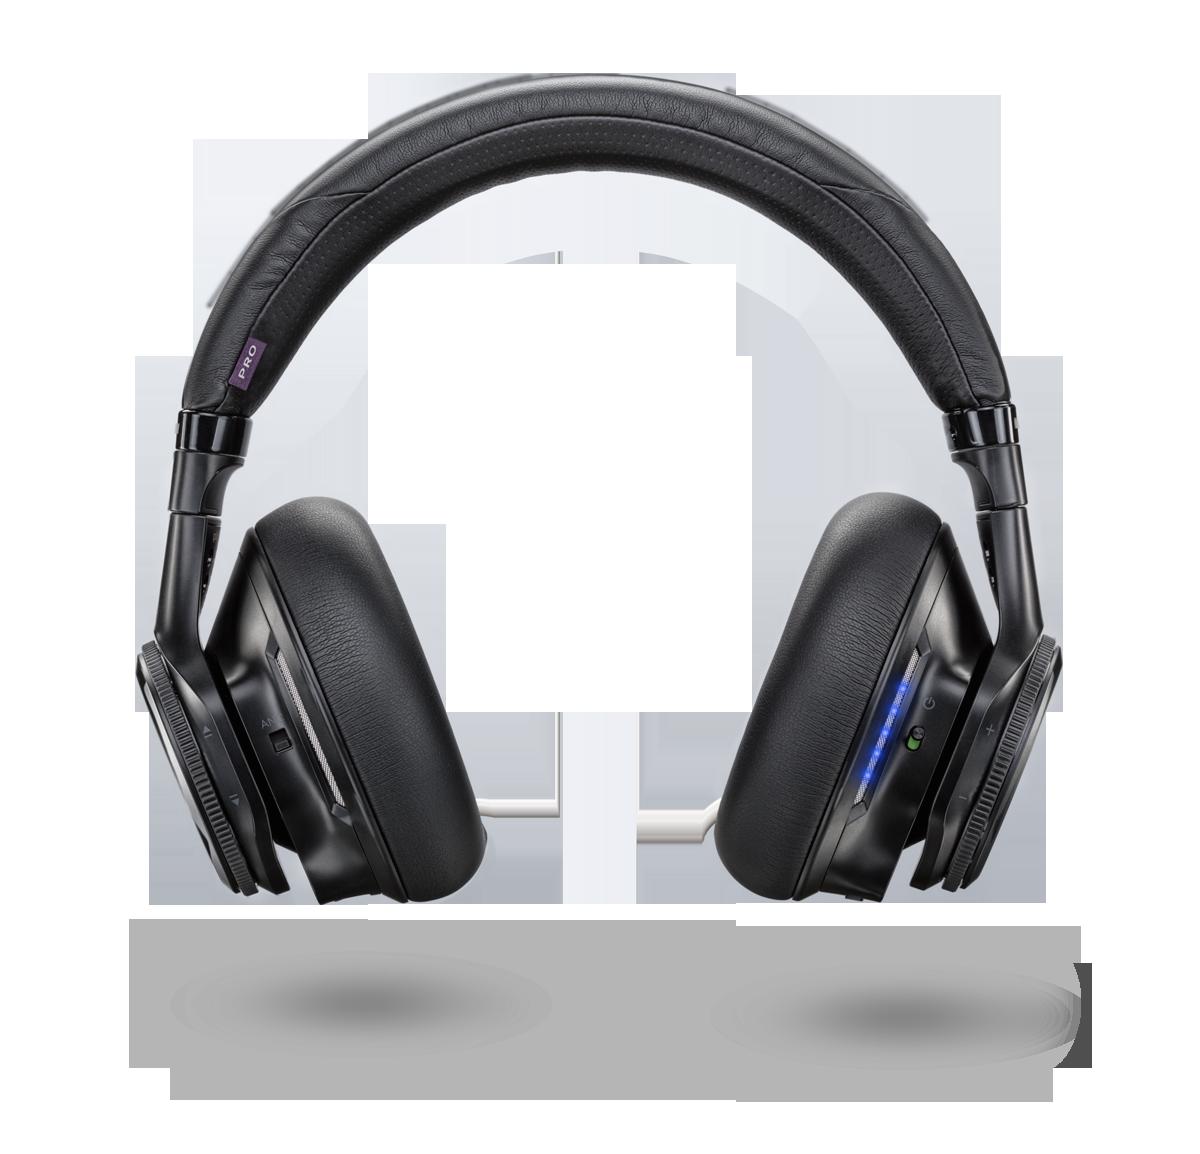 plantronics backbeat pro wireless headphones announced at